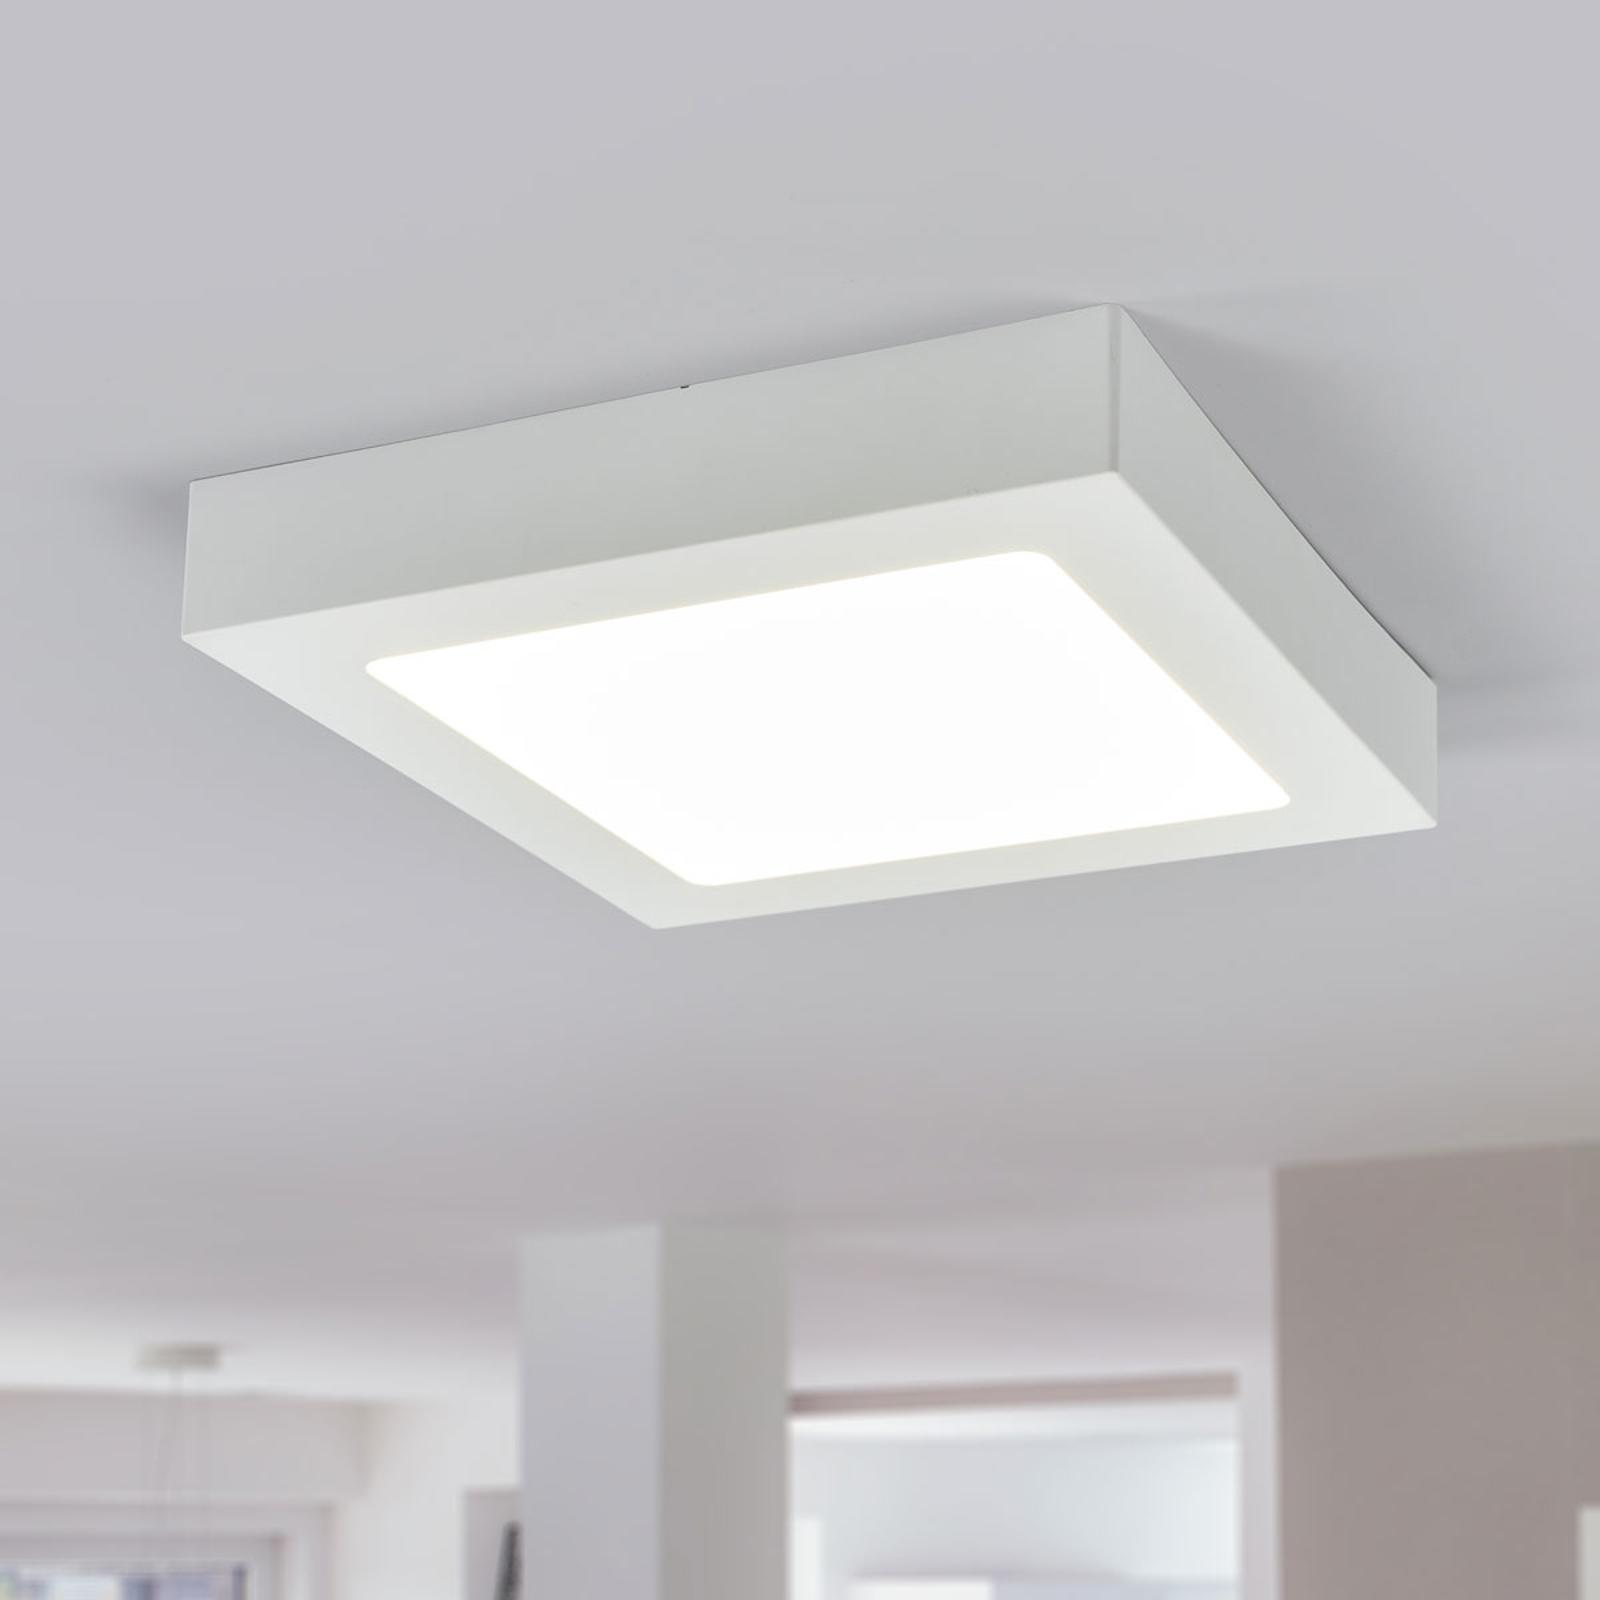 LED-loftlampe Marlo hvid 4000K kantet 23,1cm